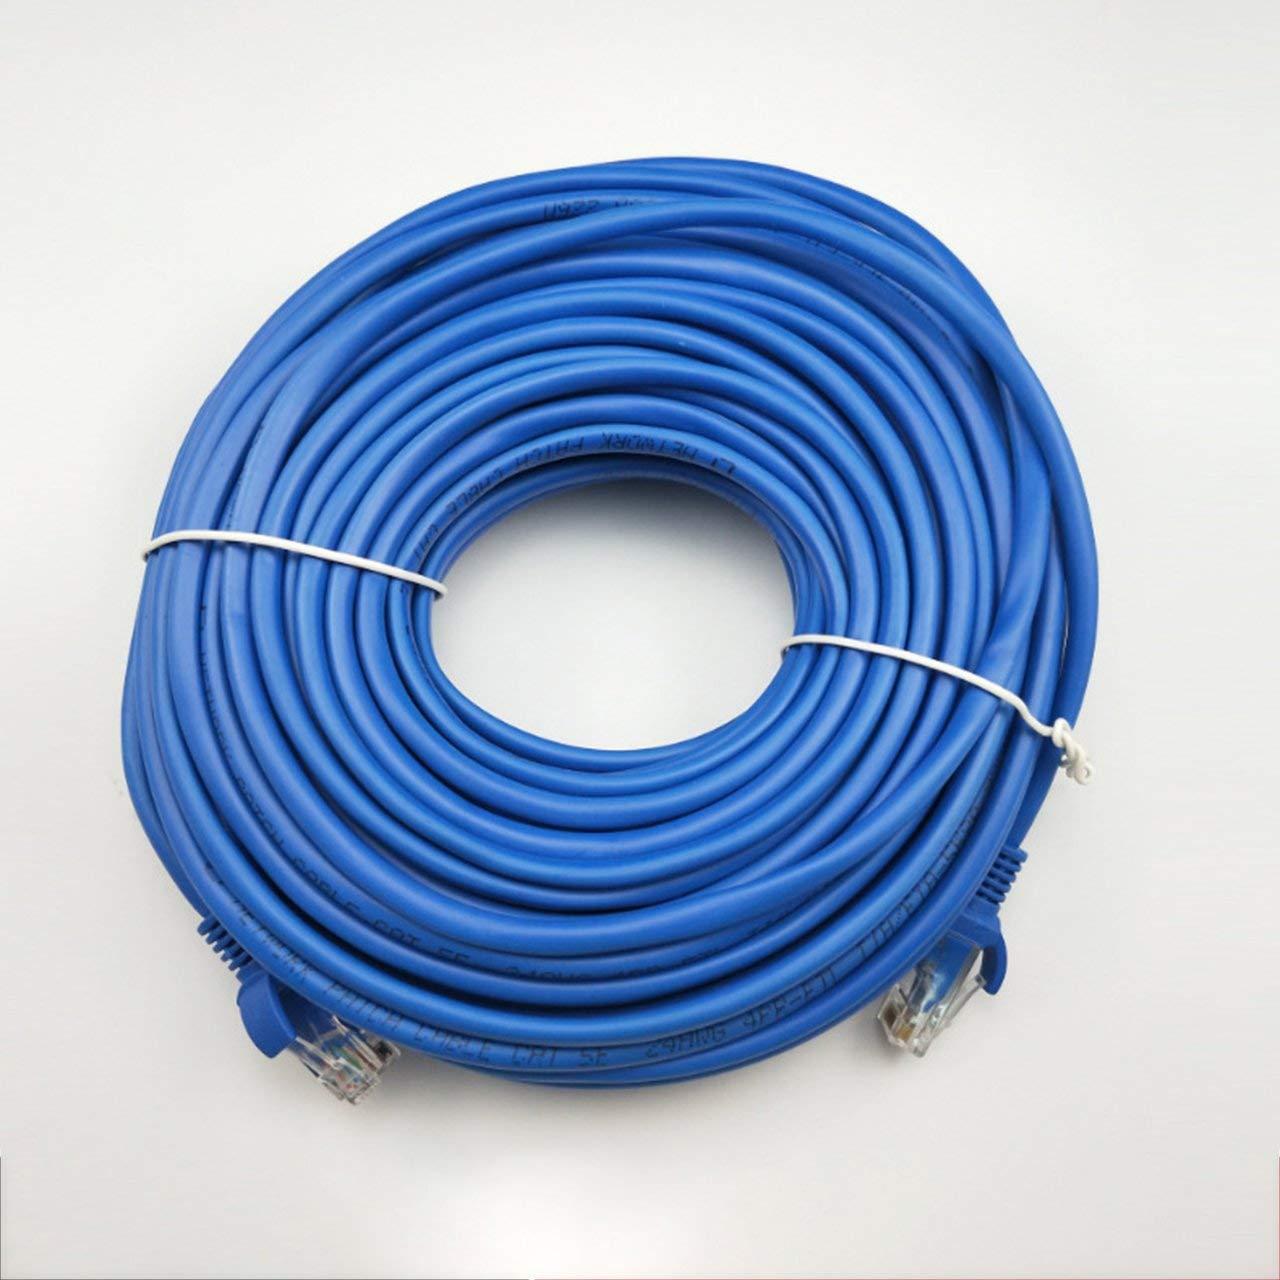 50M CAT5 CAT5E Ethernet Internet RJ45 LAN Cable Cable Cable Male Connector Reticle 100FT 5//10//15//20//25//30